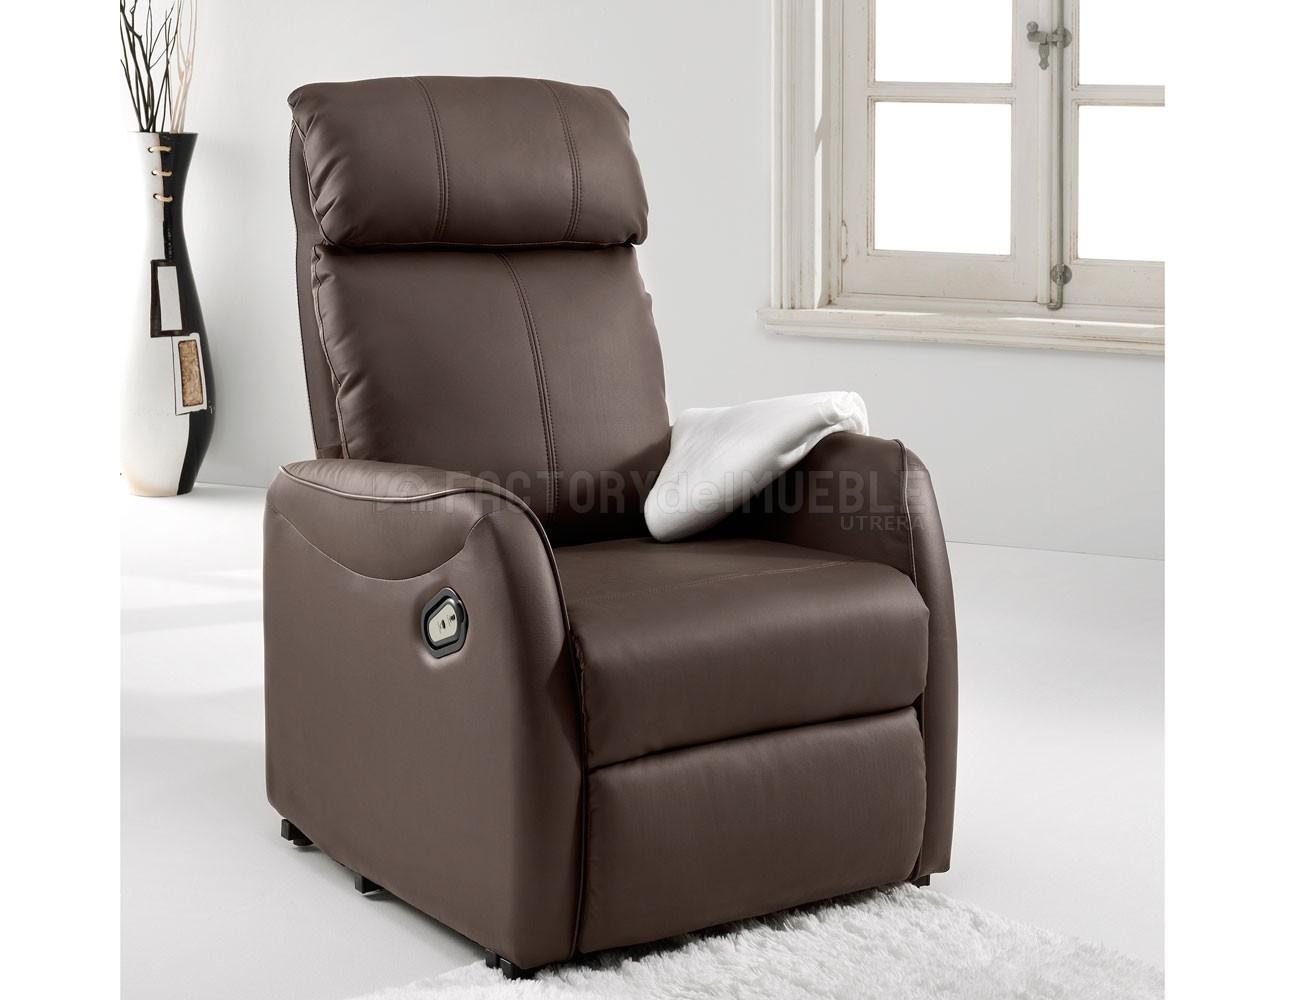 Sillon relax levanta personas power lift simil piel choco1